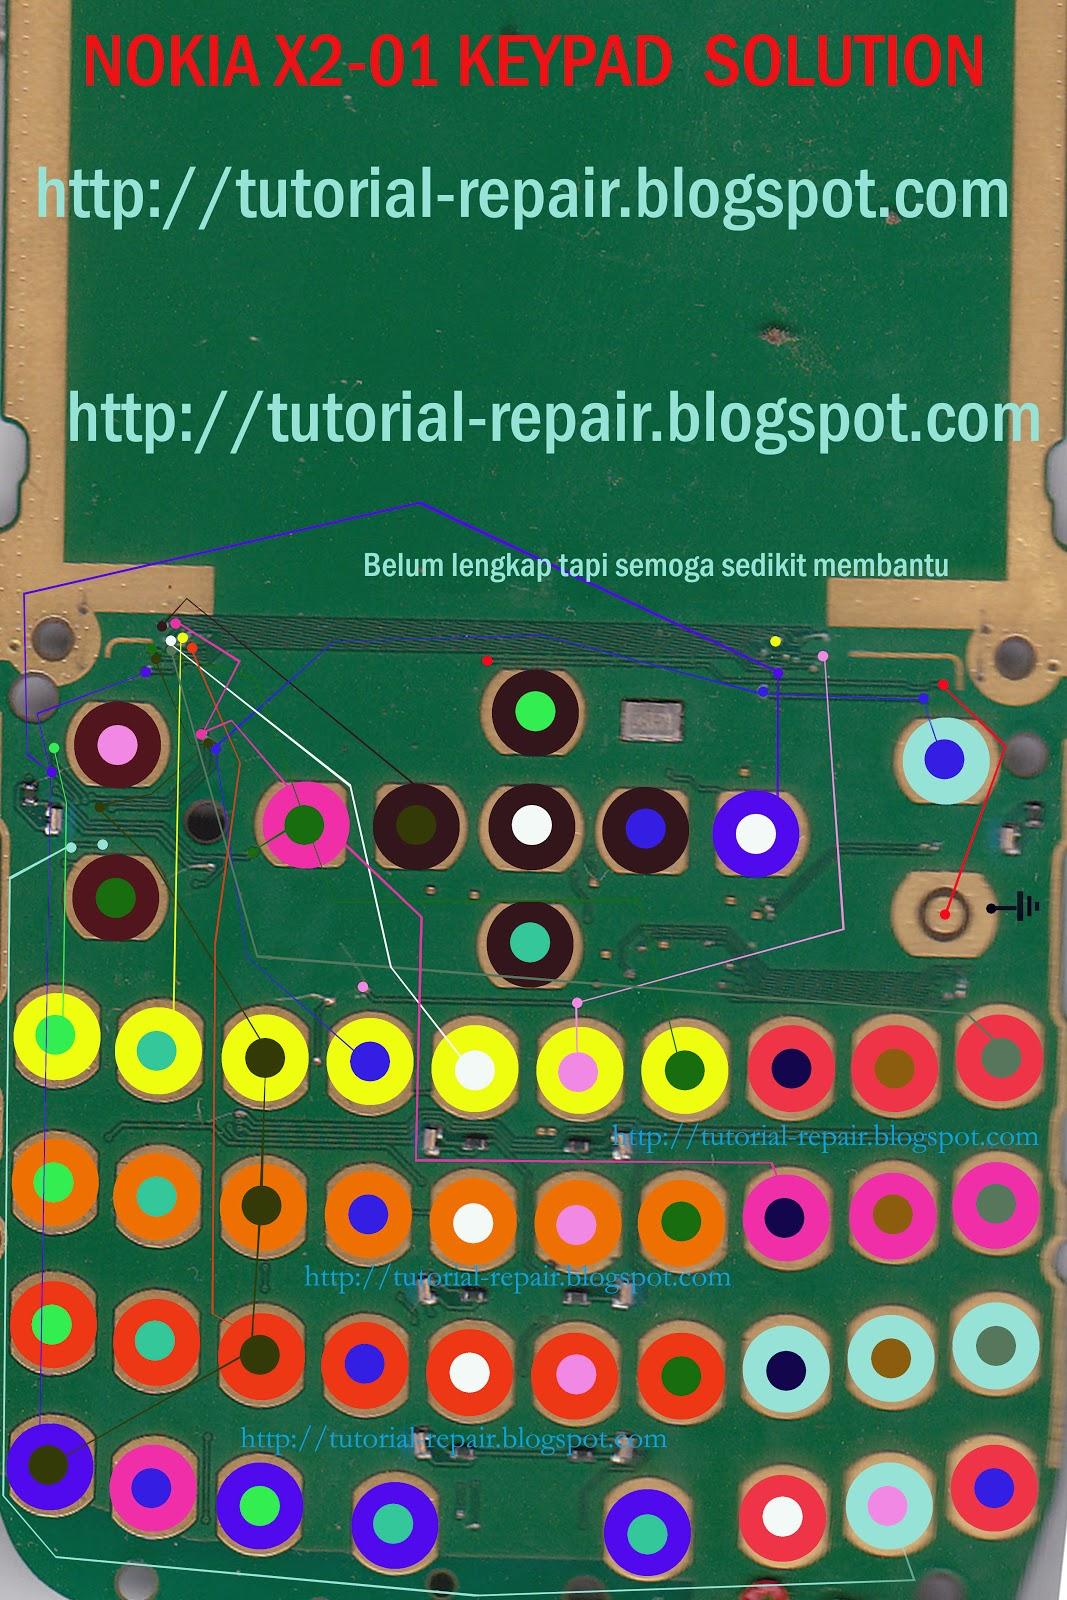 Nokia X2-01 Keypad Solution